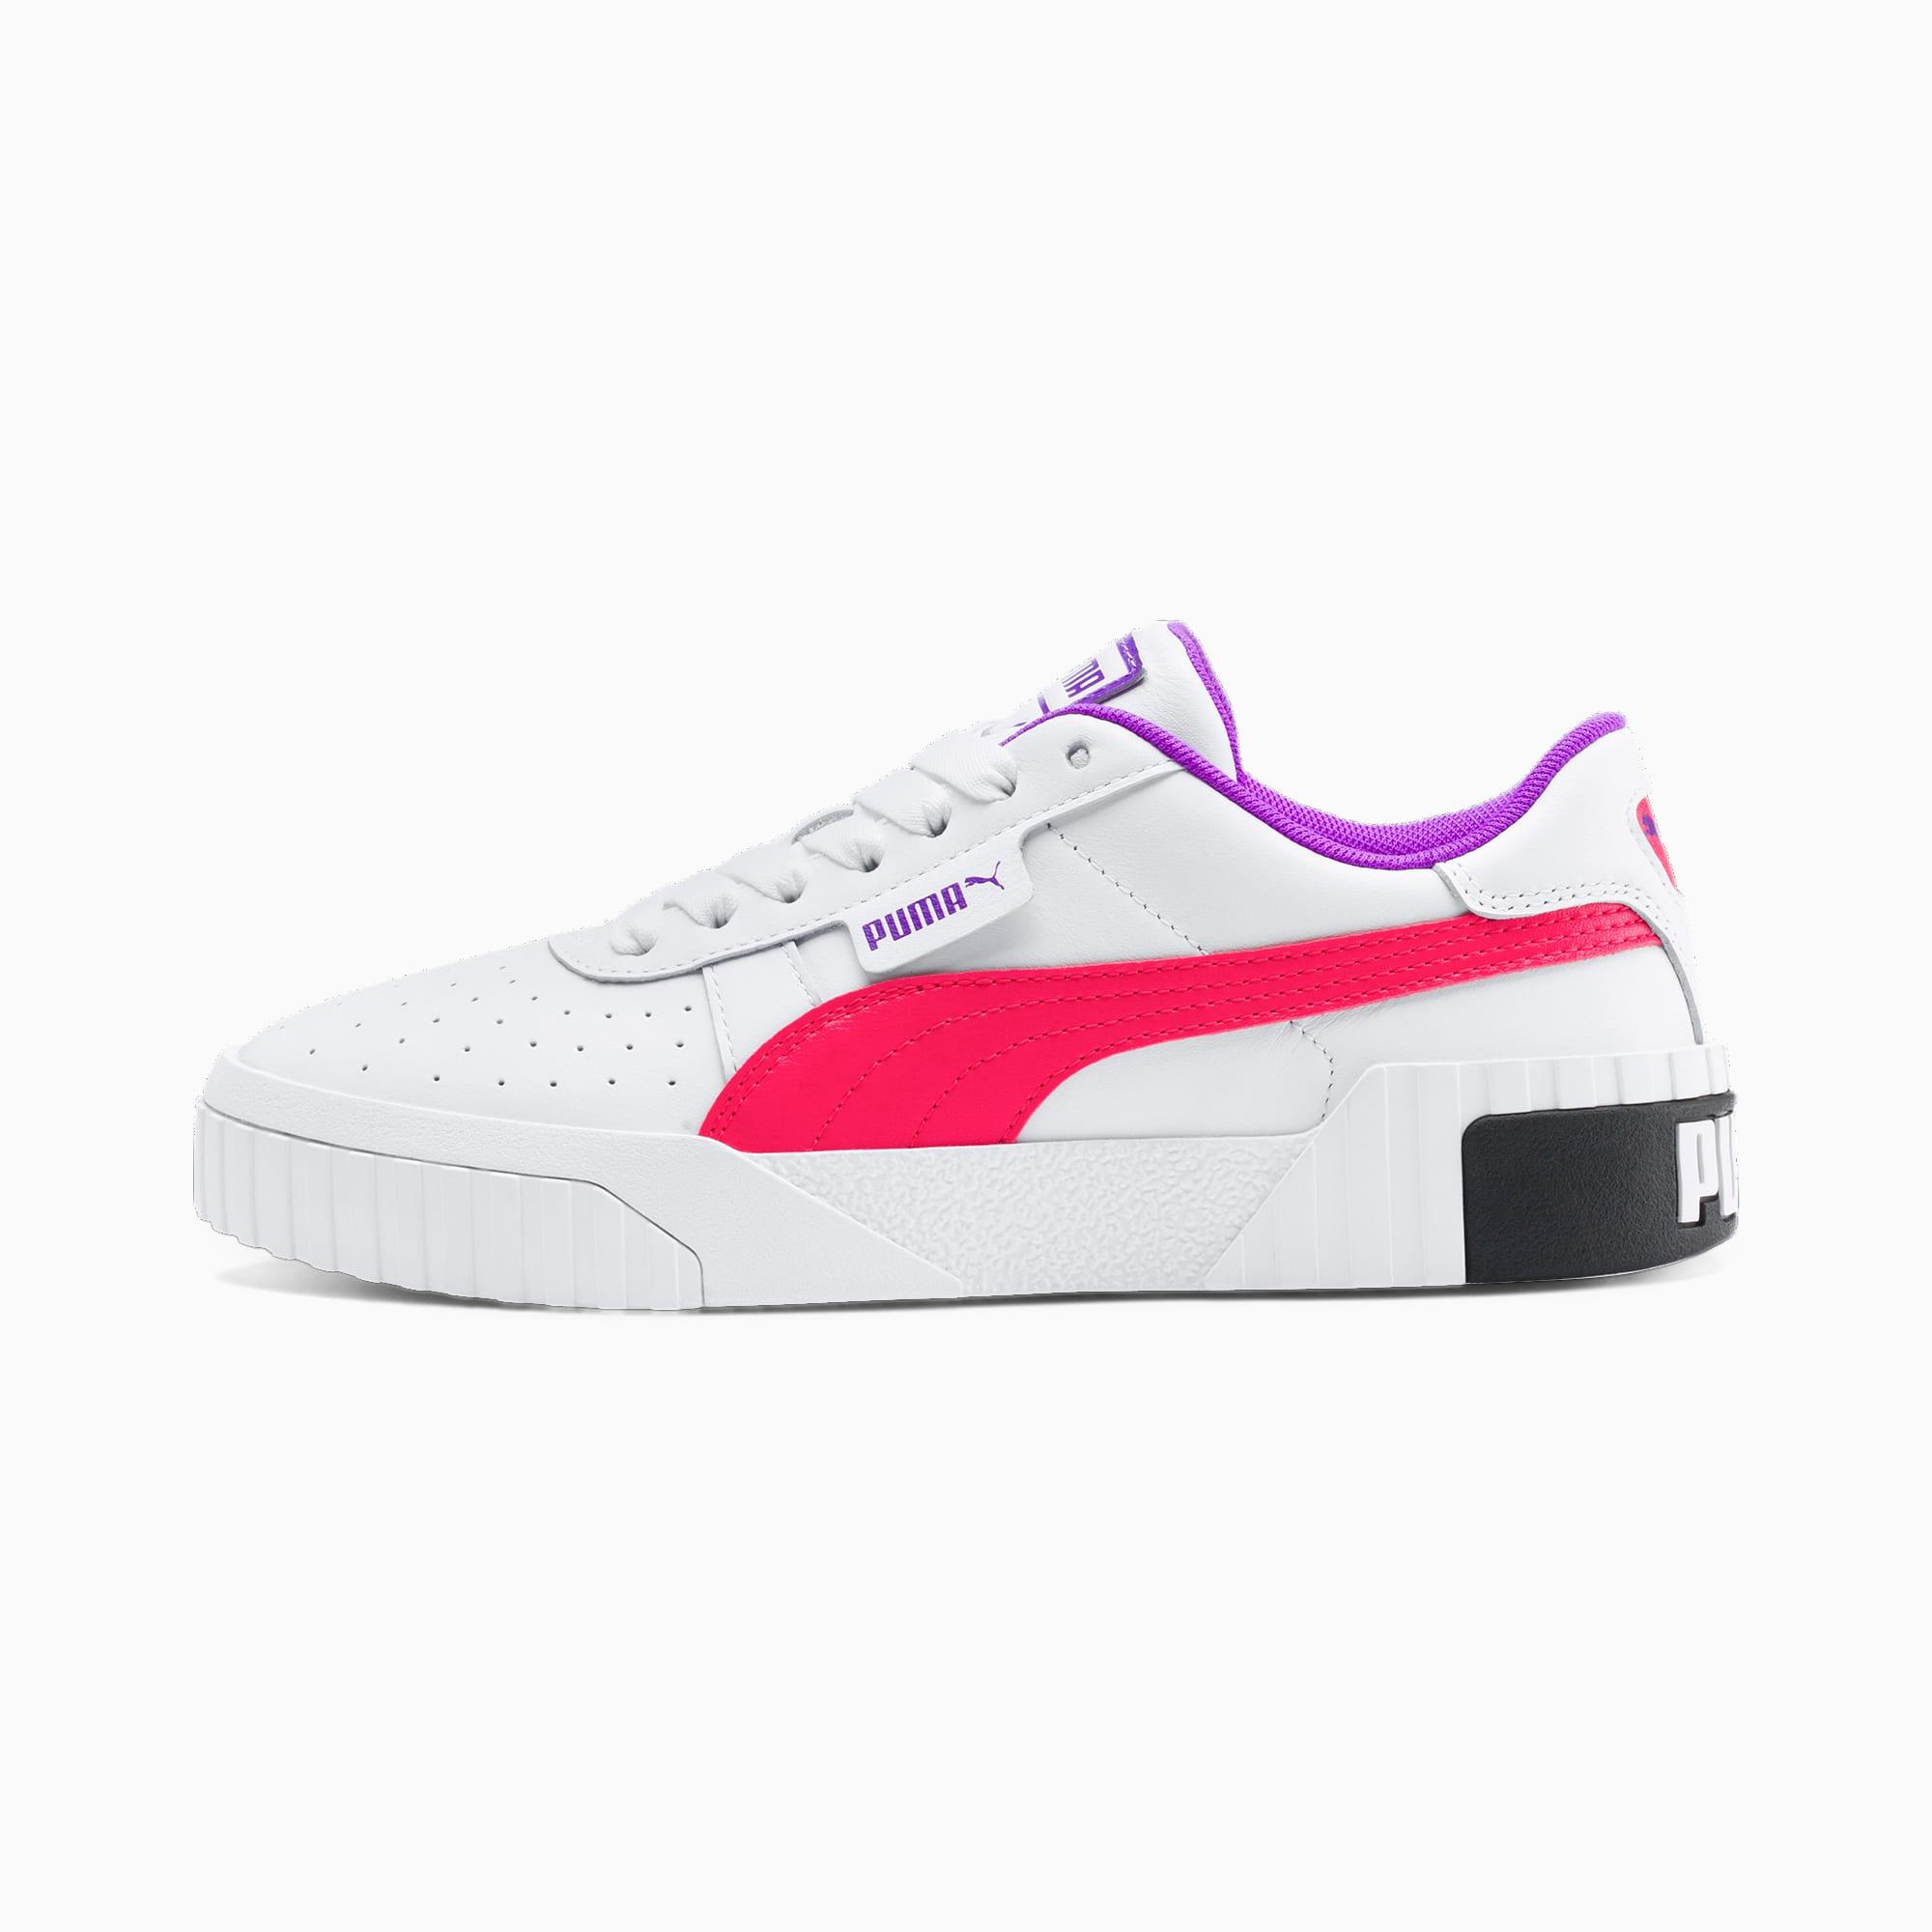 sneakers femme puma violette